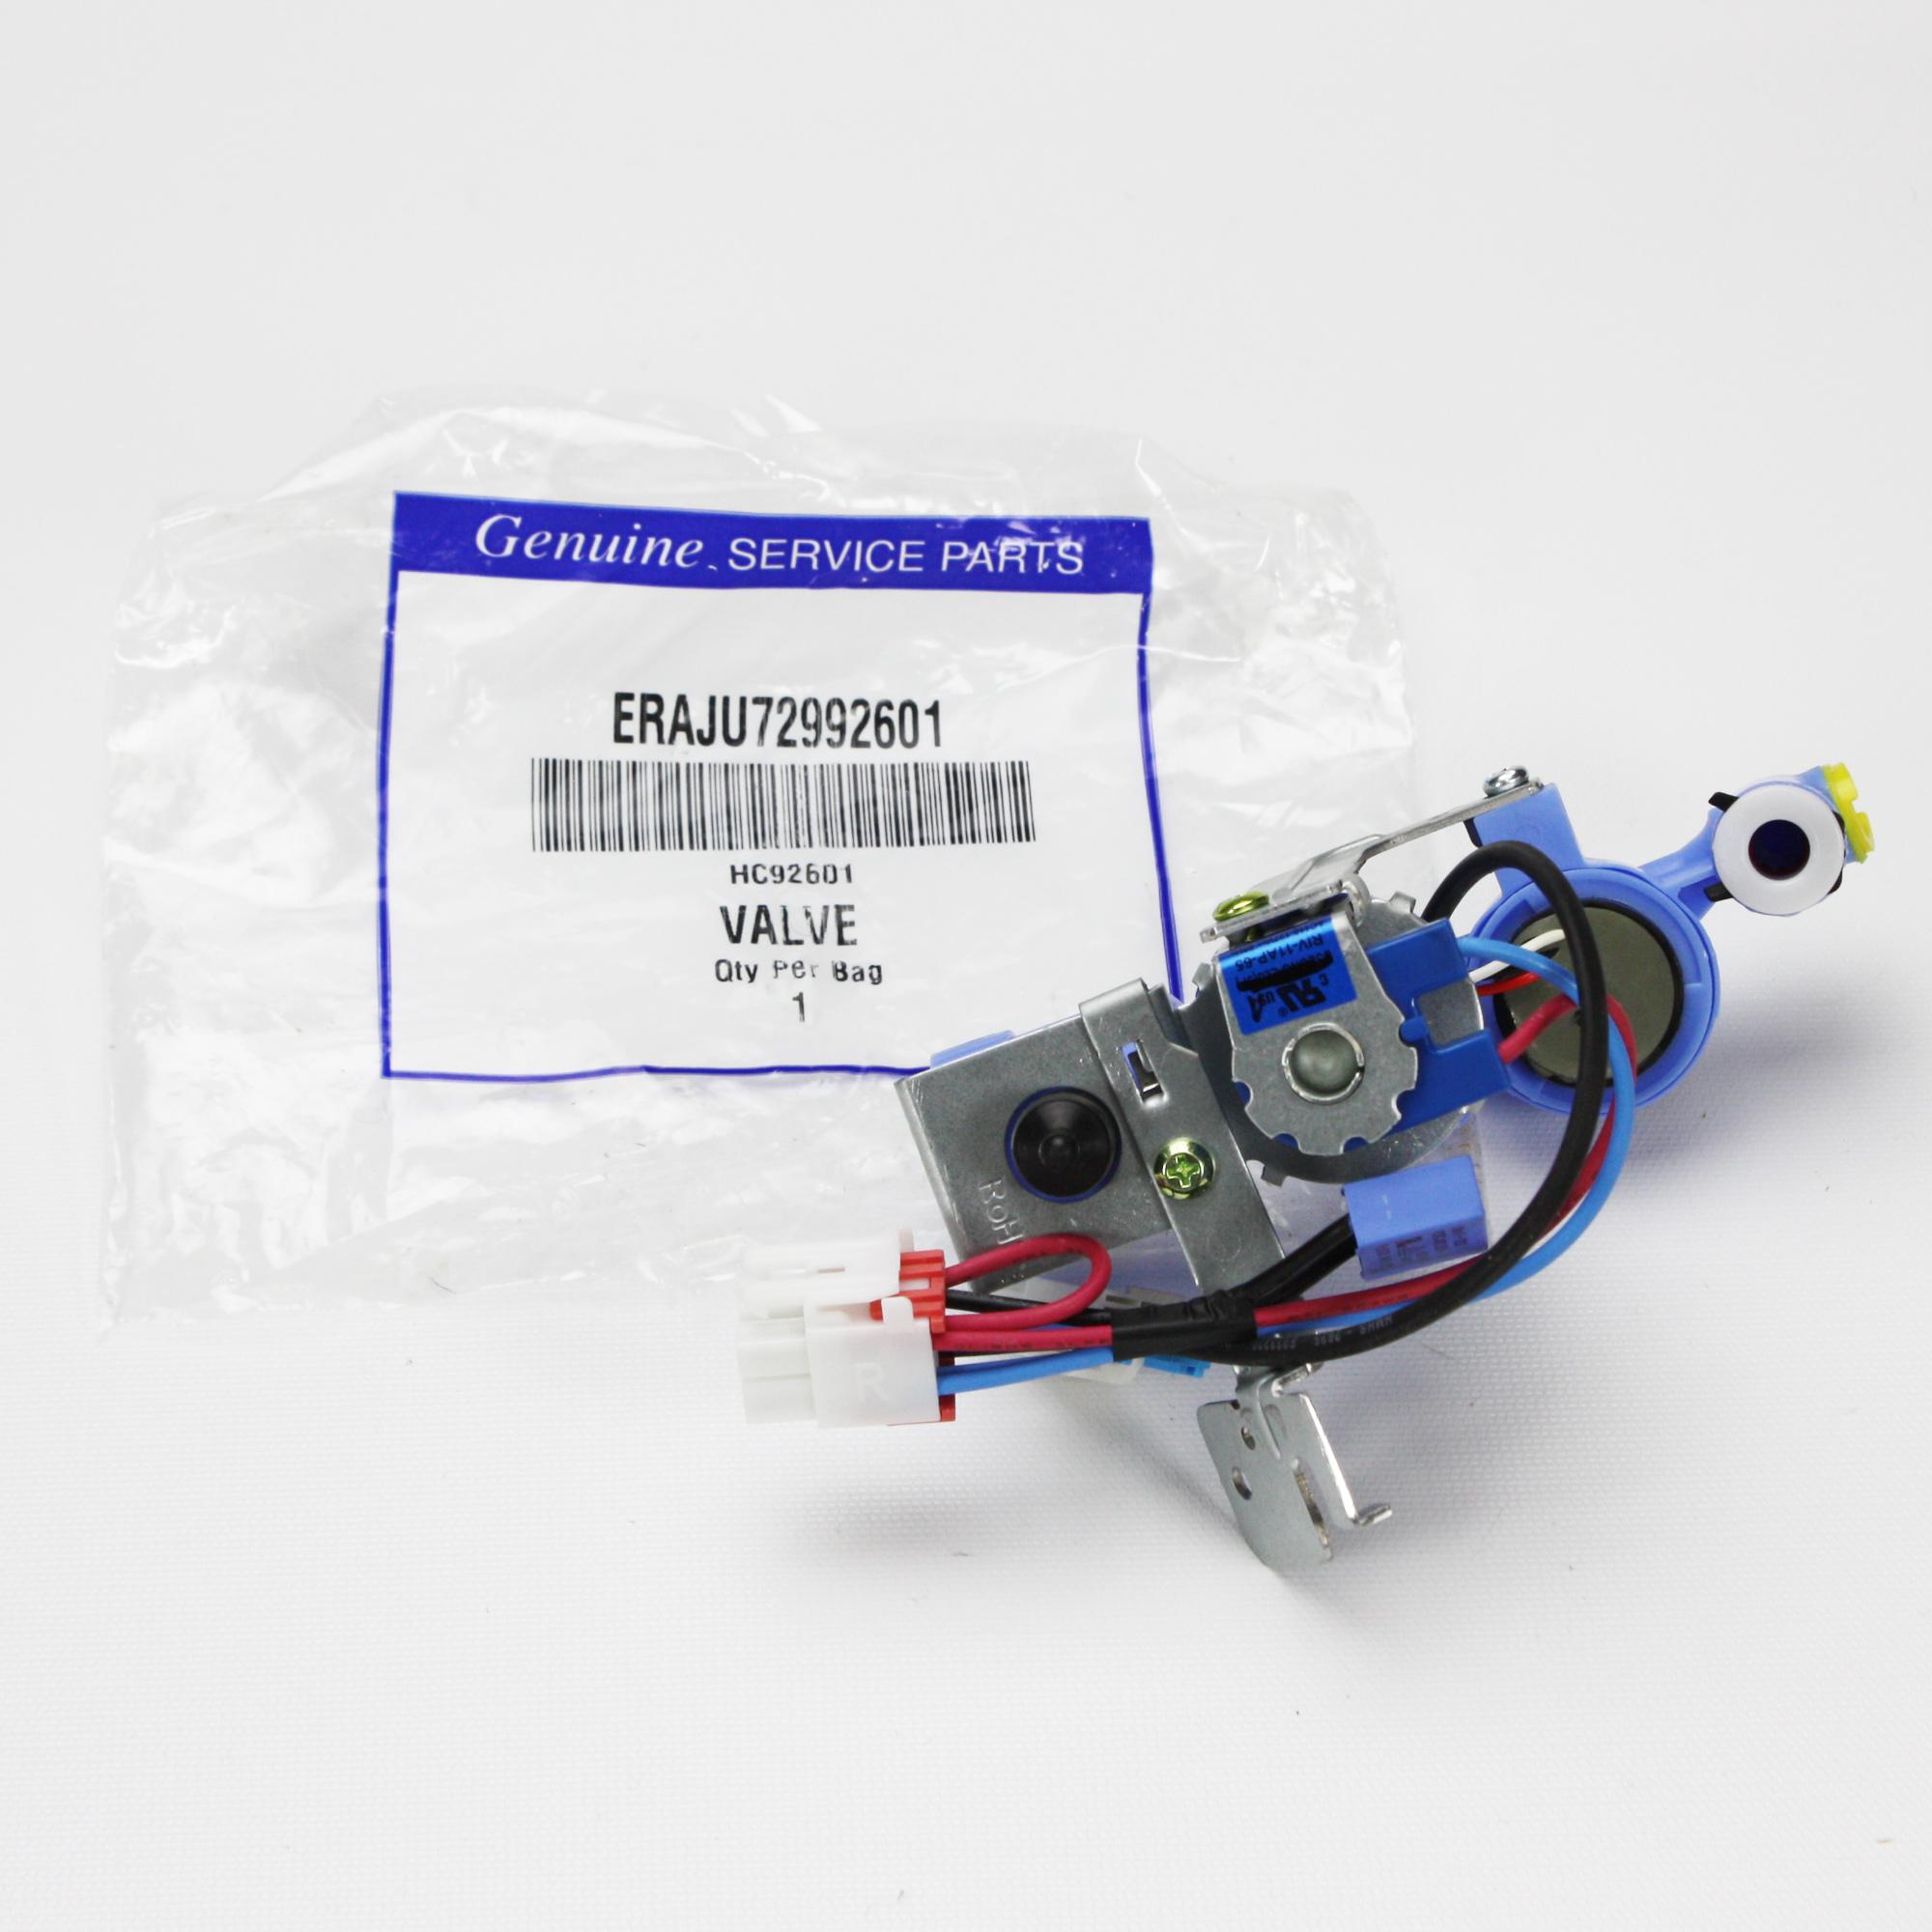 Valve Replacement Kenmore Refrigerator Water Valve